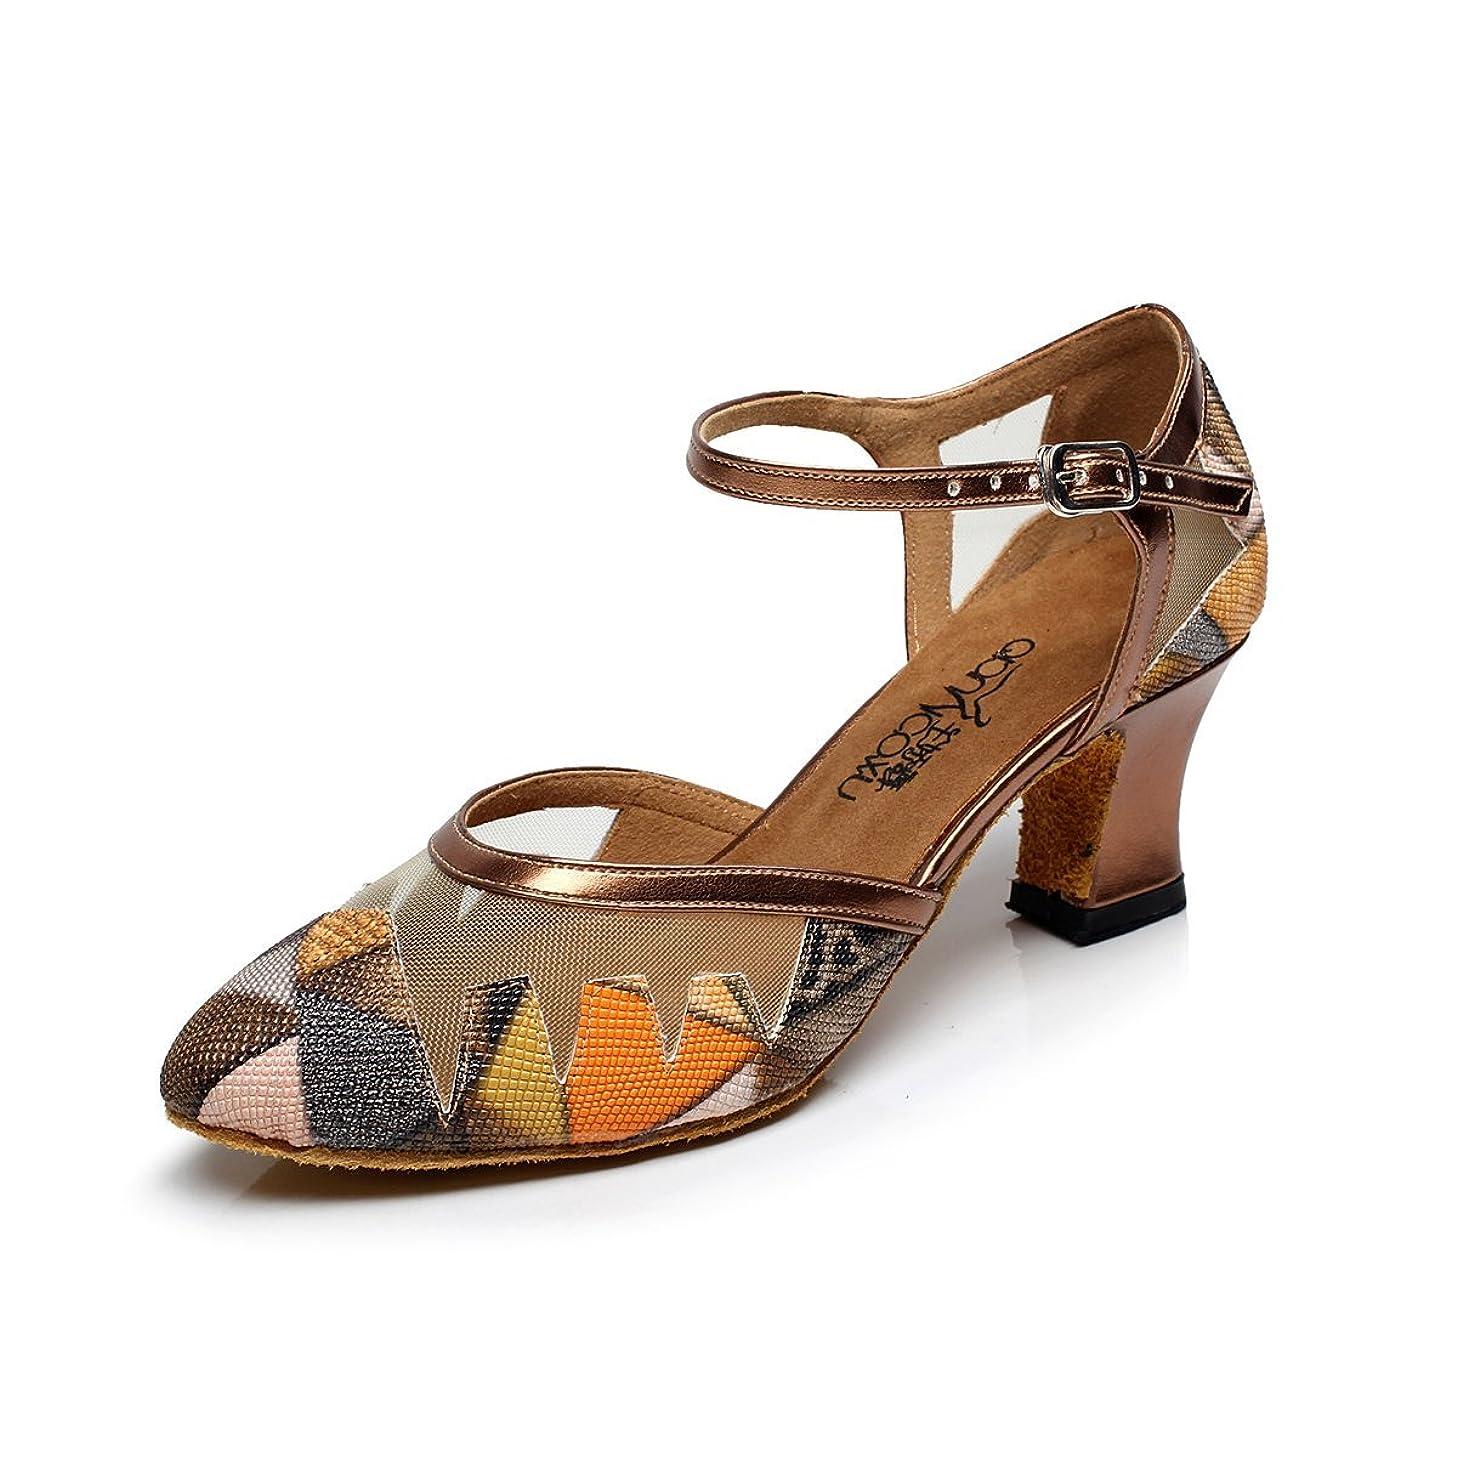 BAYSA Women Mesh Upper Leather Latin Dance Shoes 5.5CM Heel